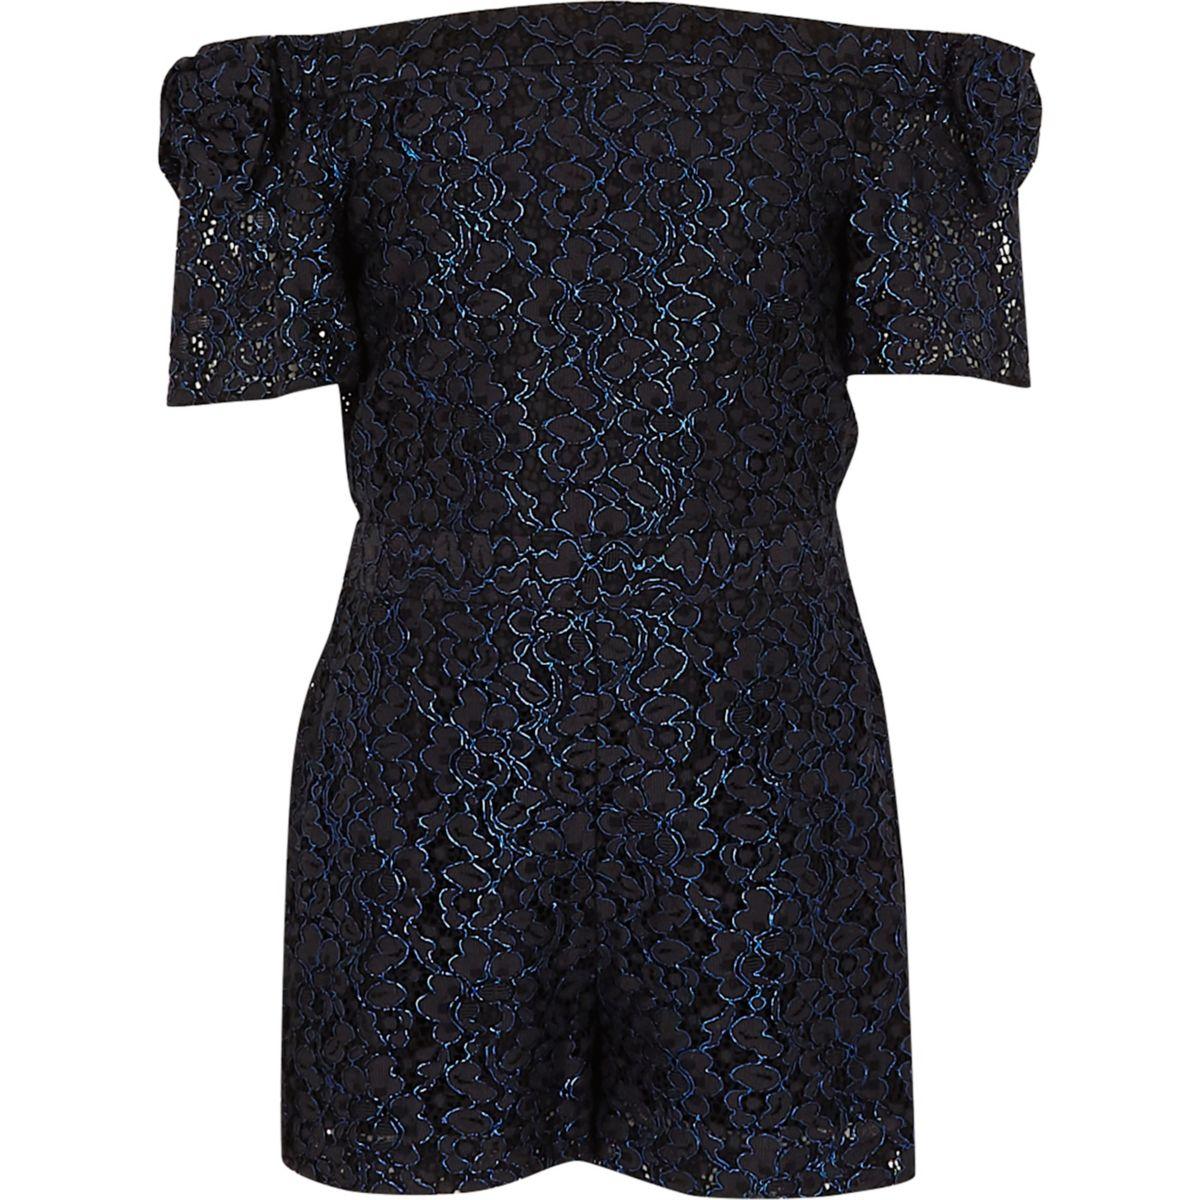 Girls blue metallic lace bardot romper